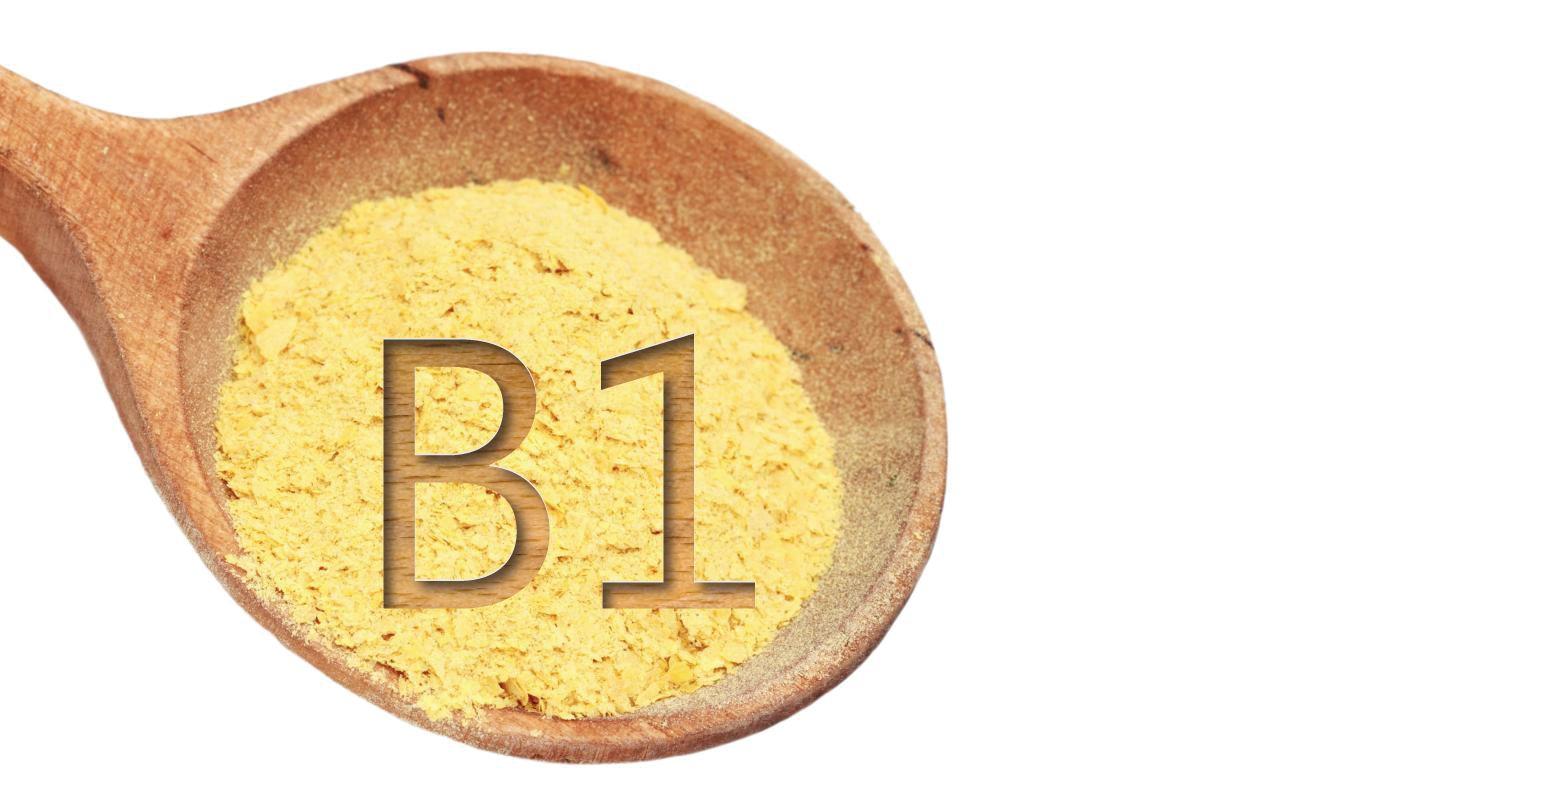 Sources of Vitamin B1 (Thiamin)